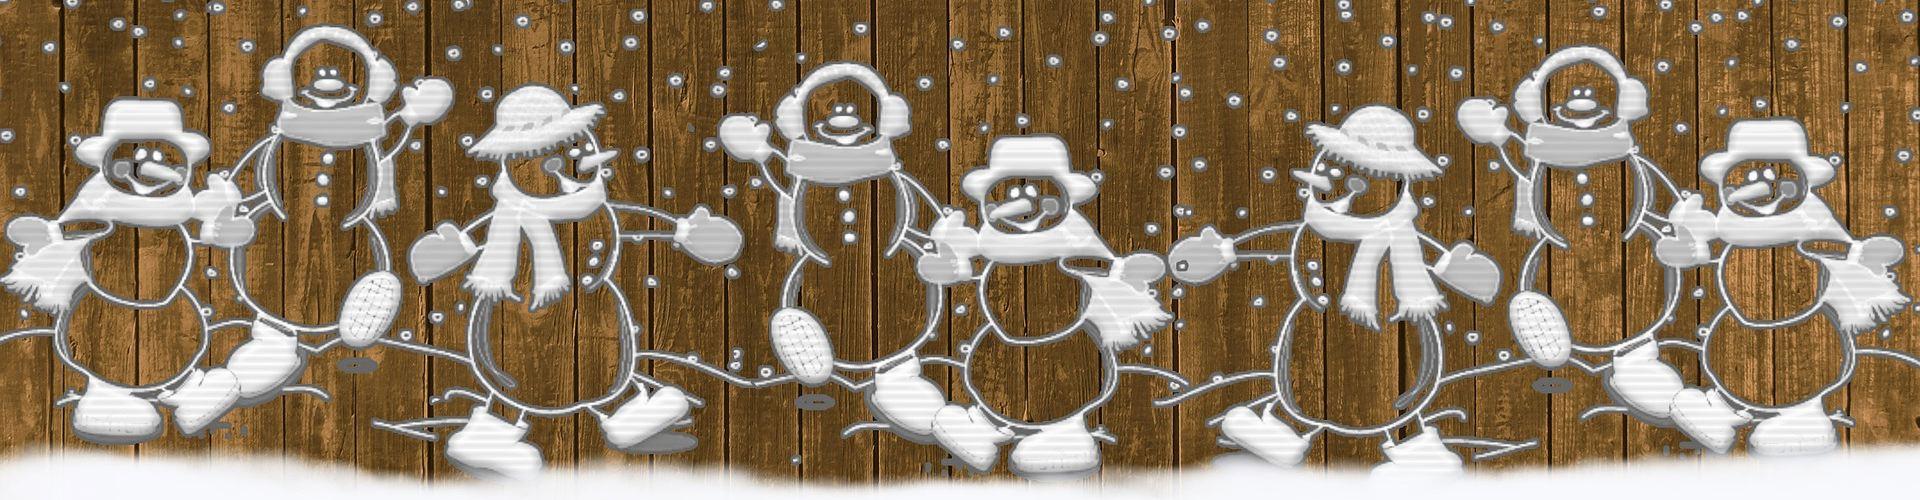 navidades sin ruido